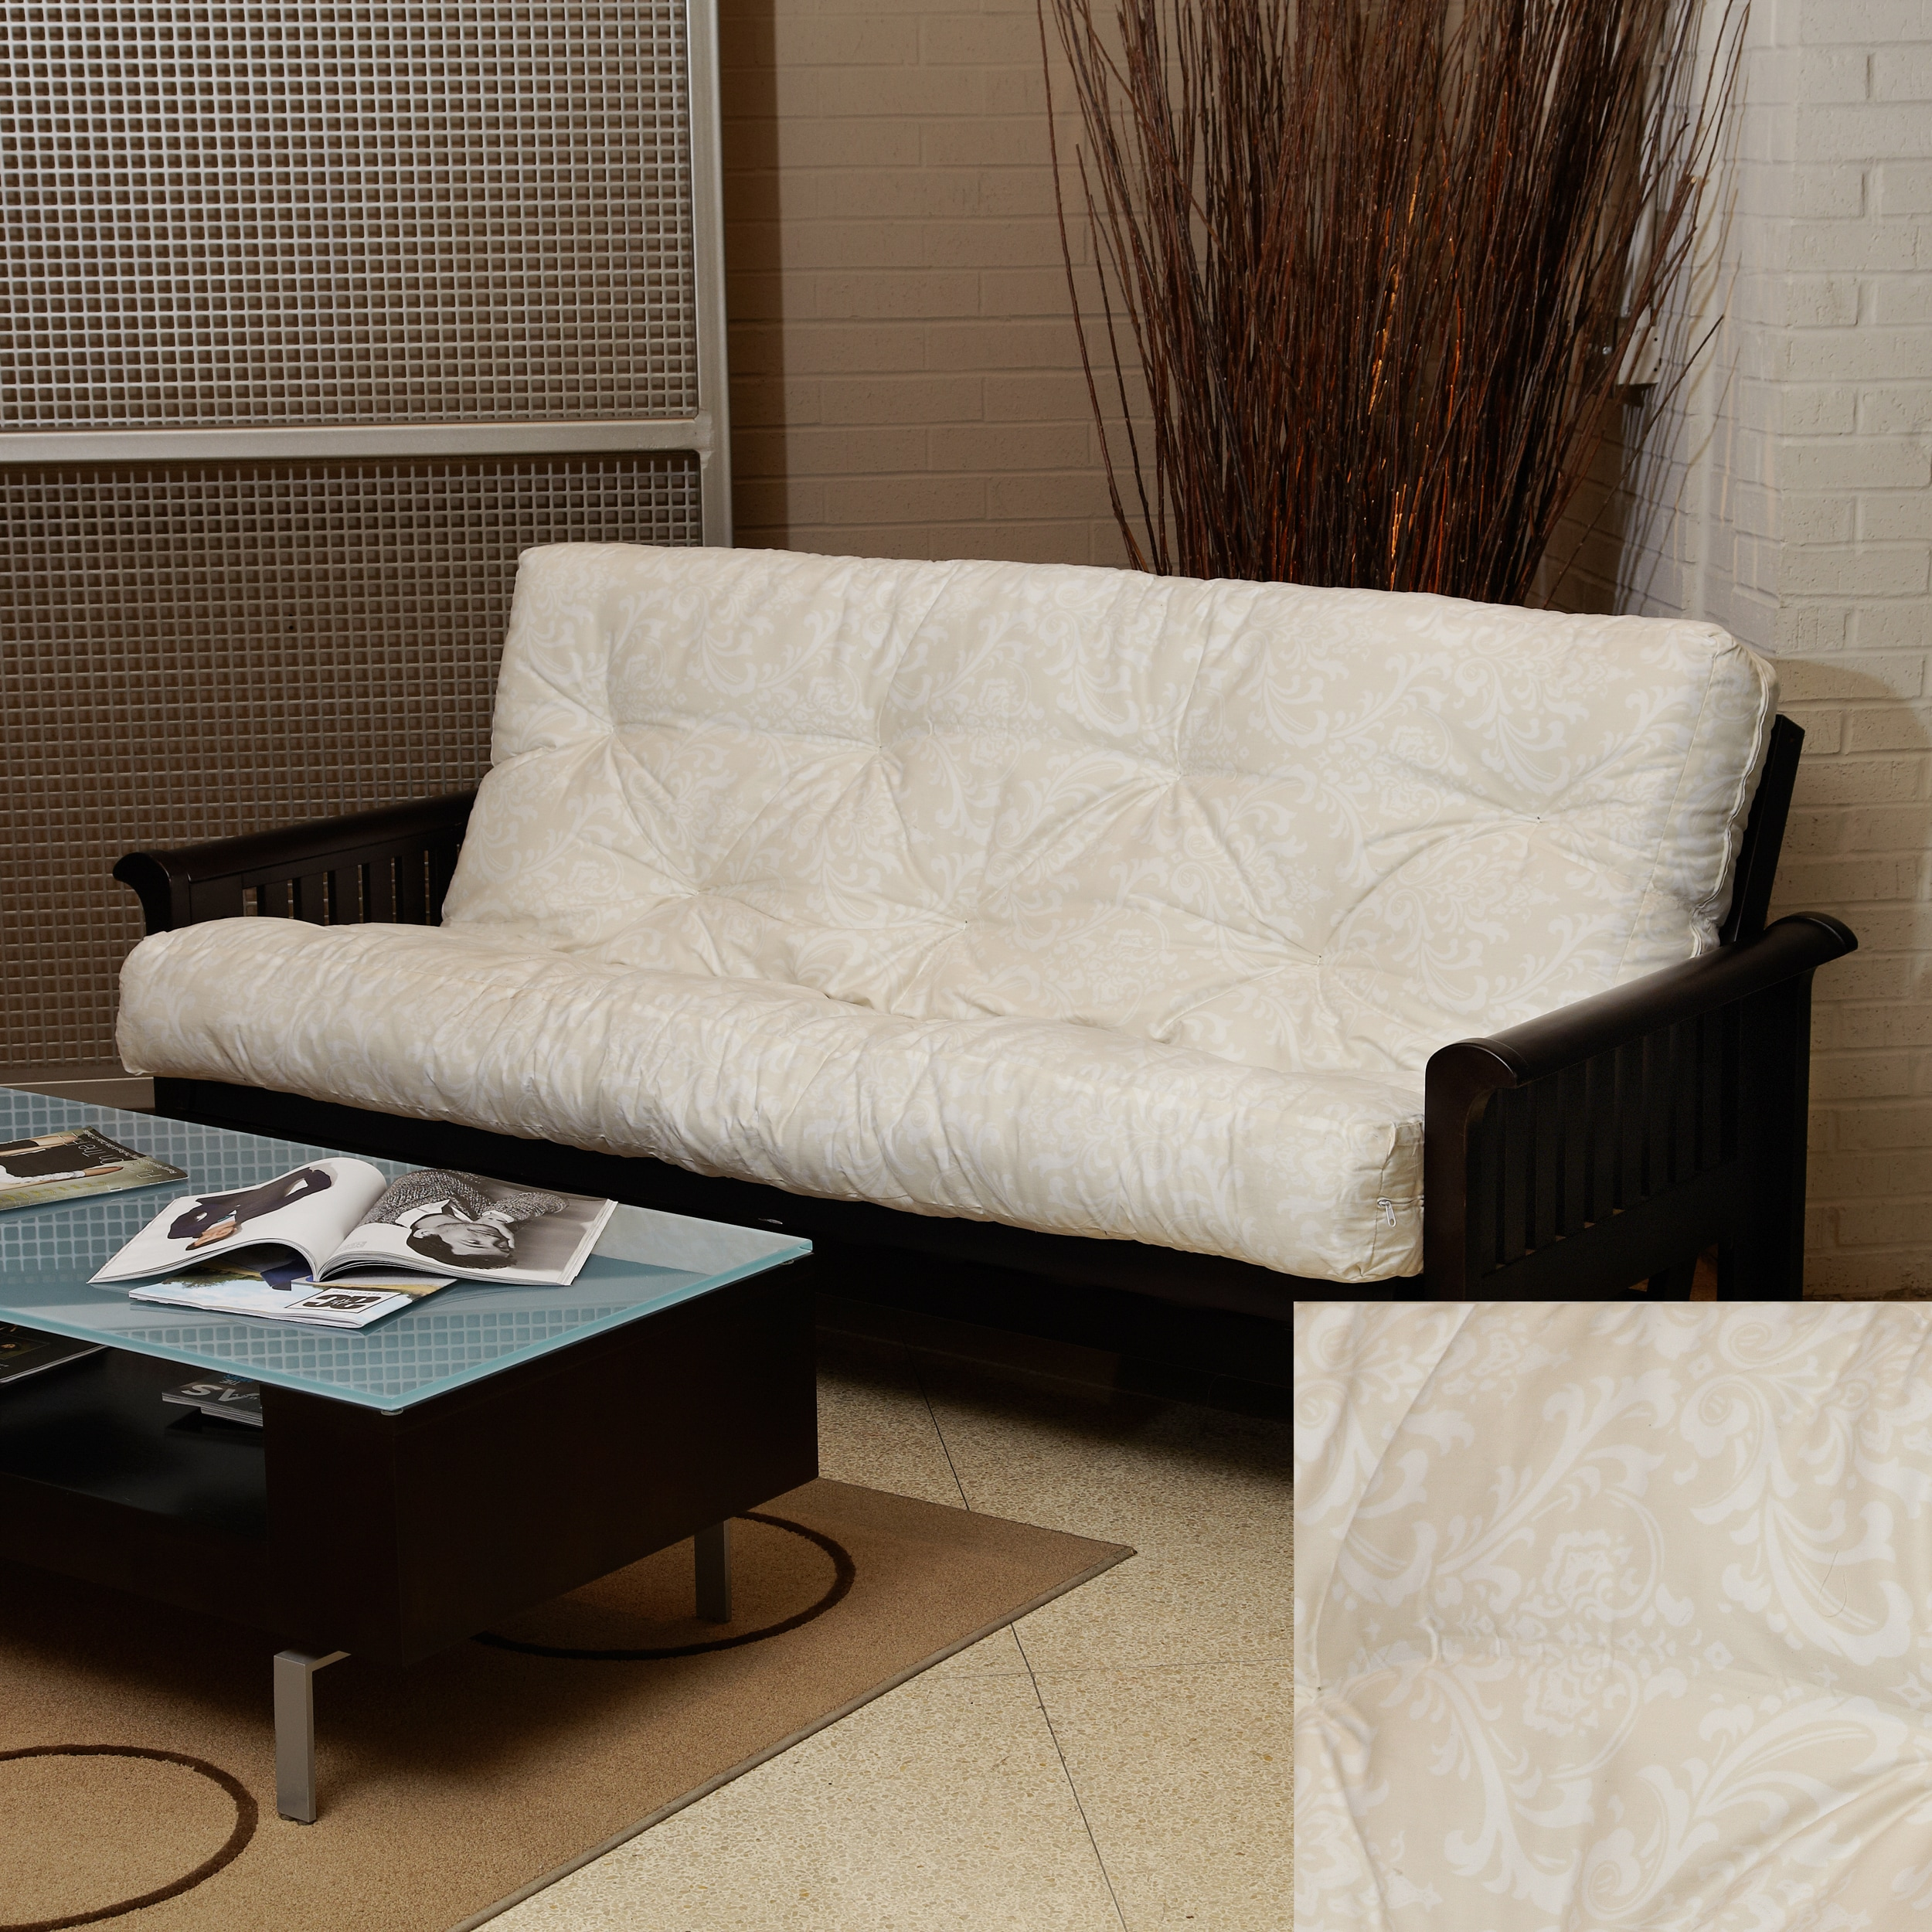 Beige Damask Full-Size 6-inch Futon Mattress